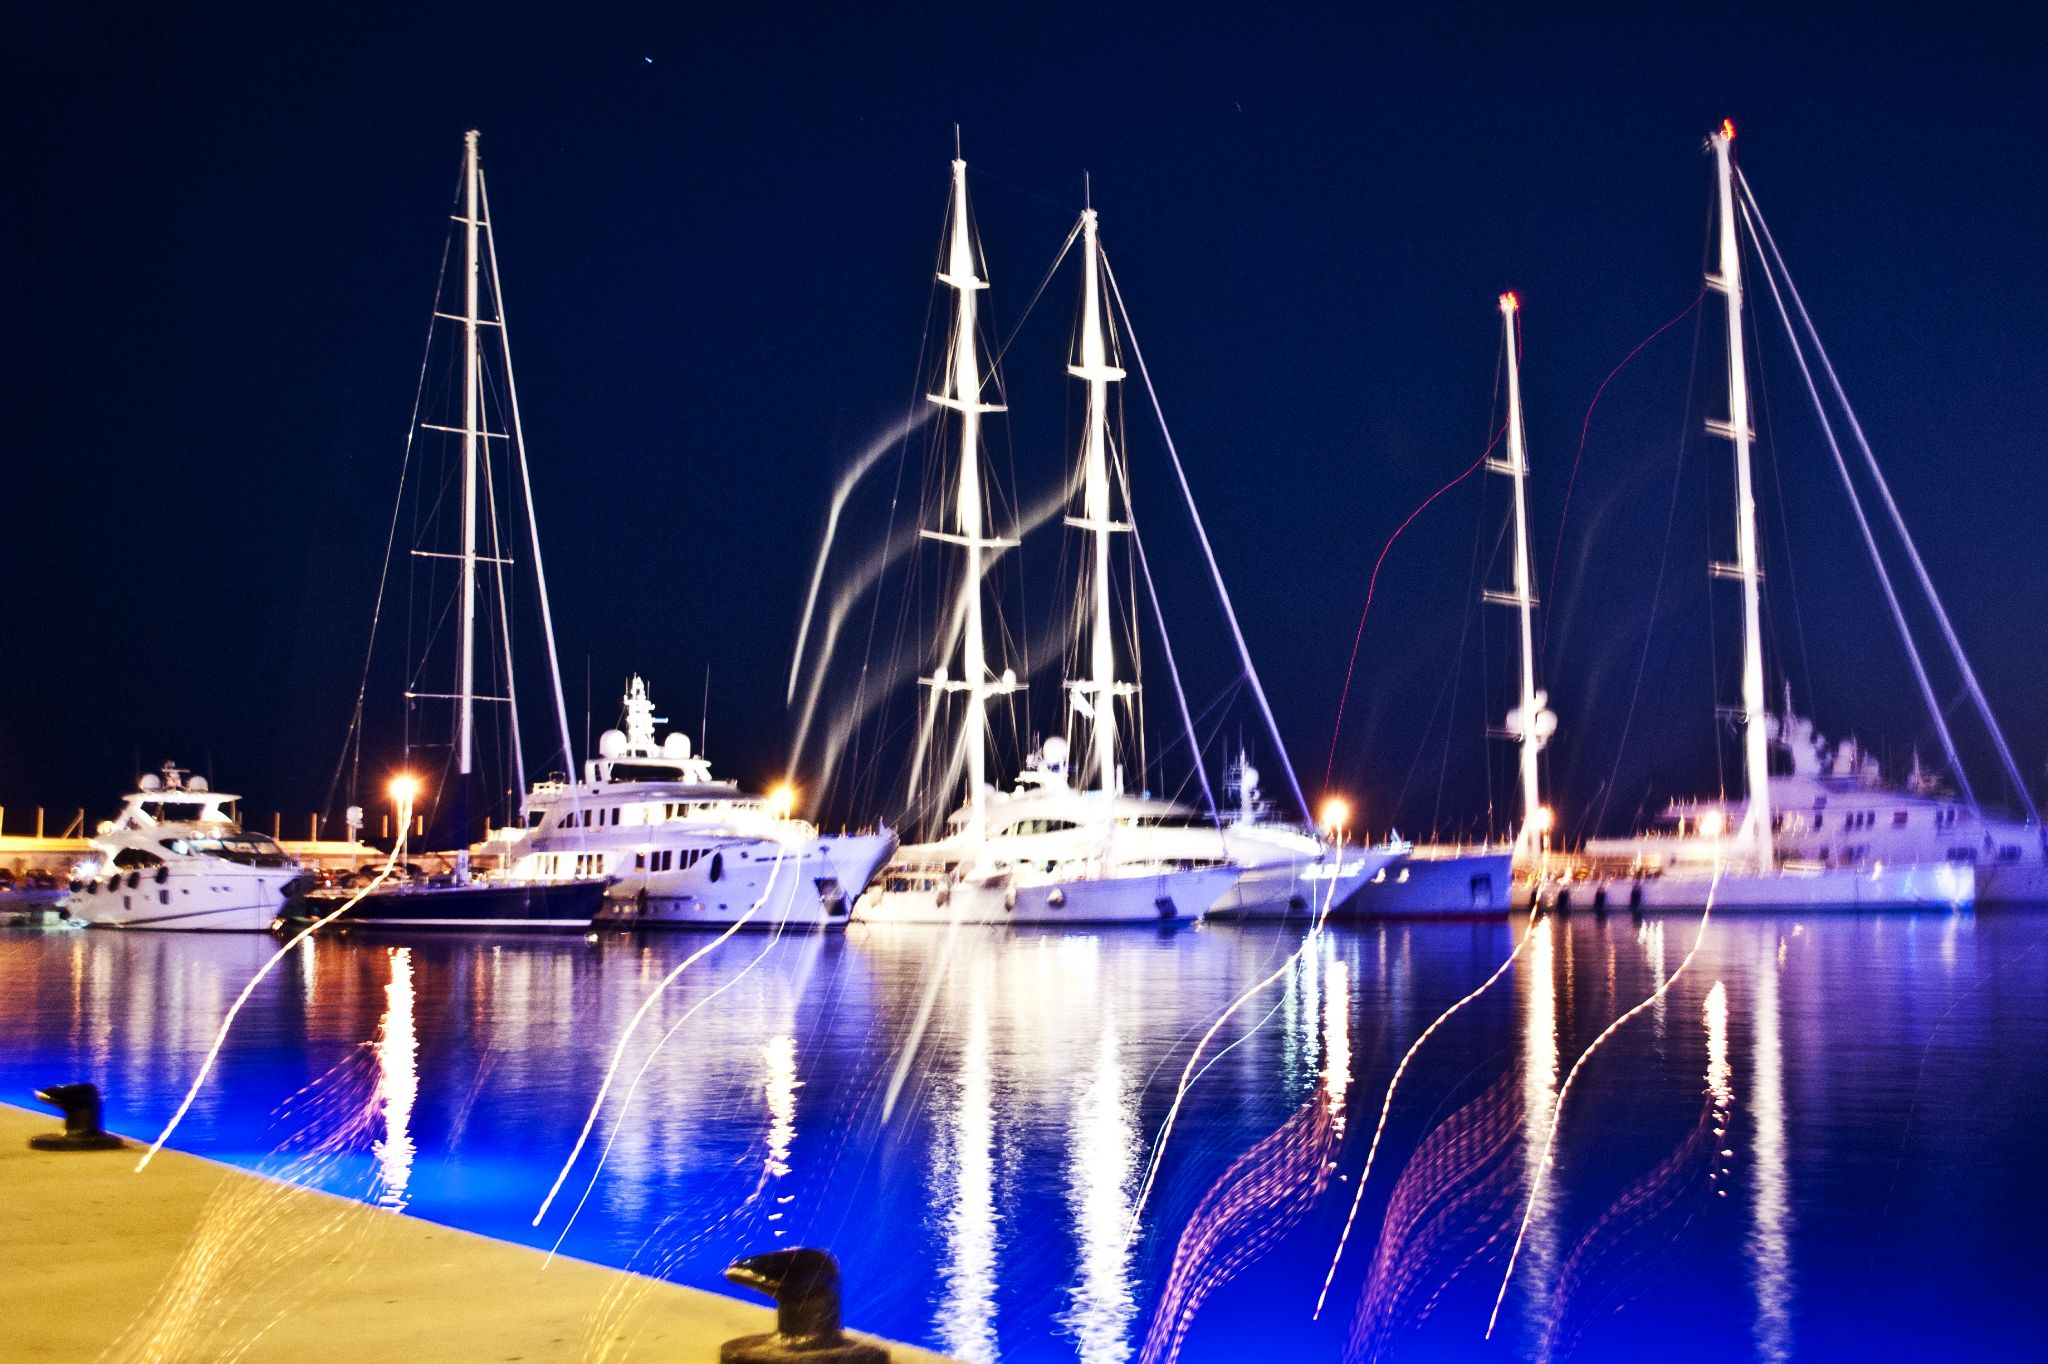 Marina Lights by Elkart_Photography